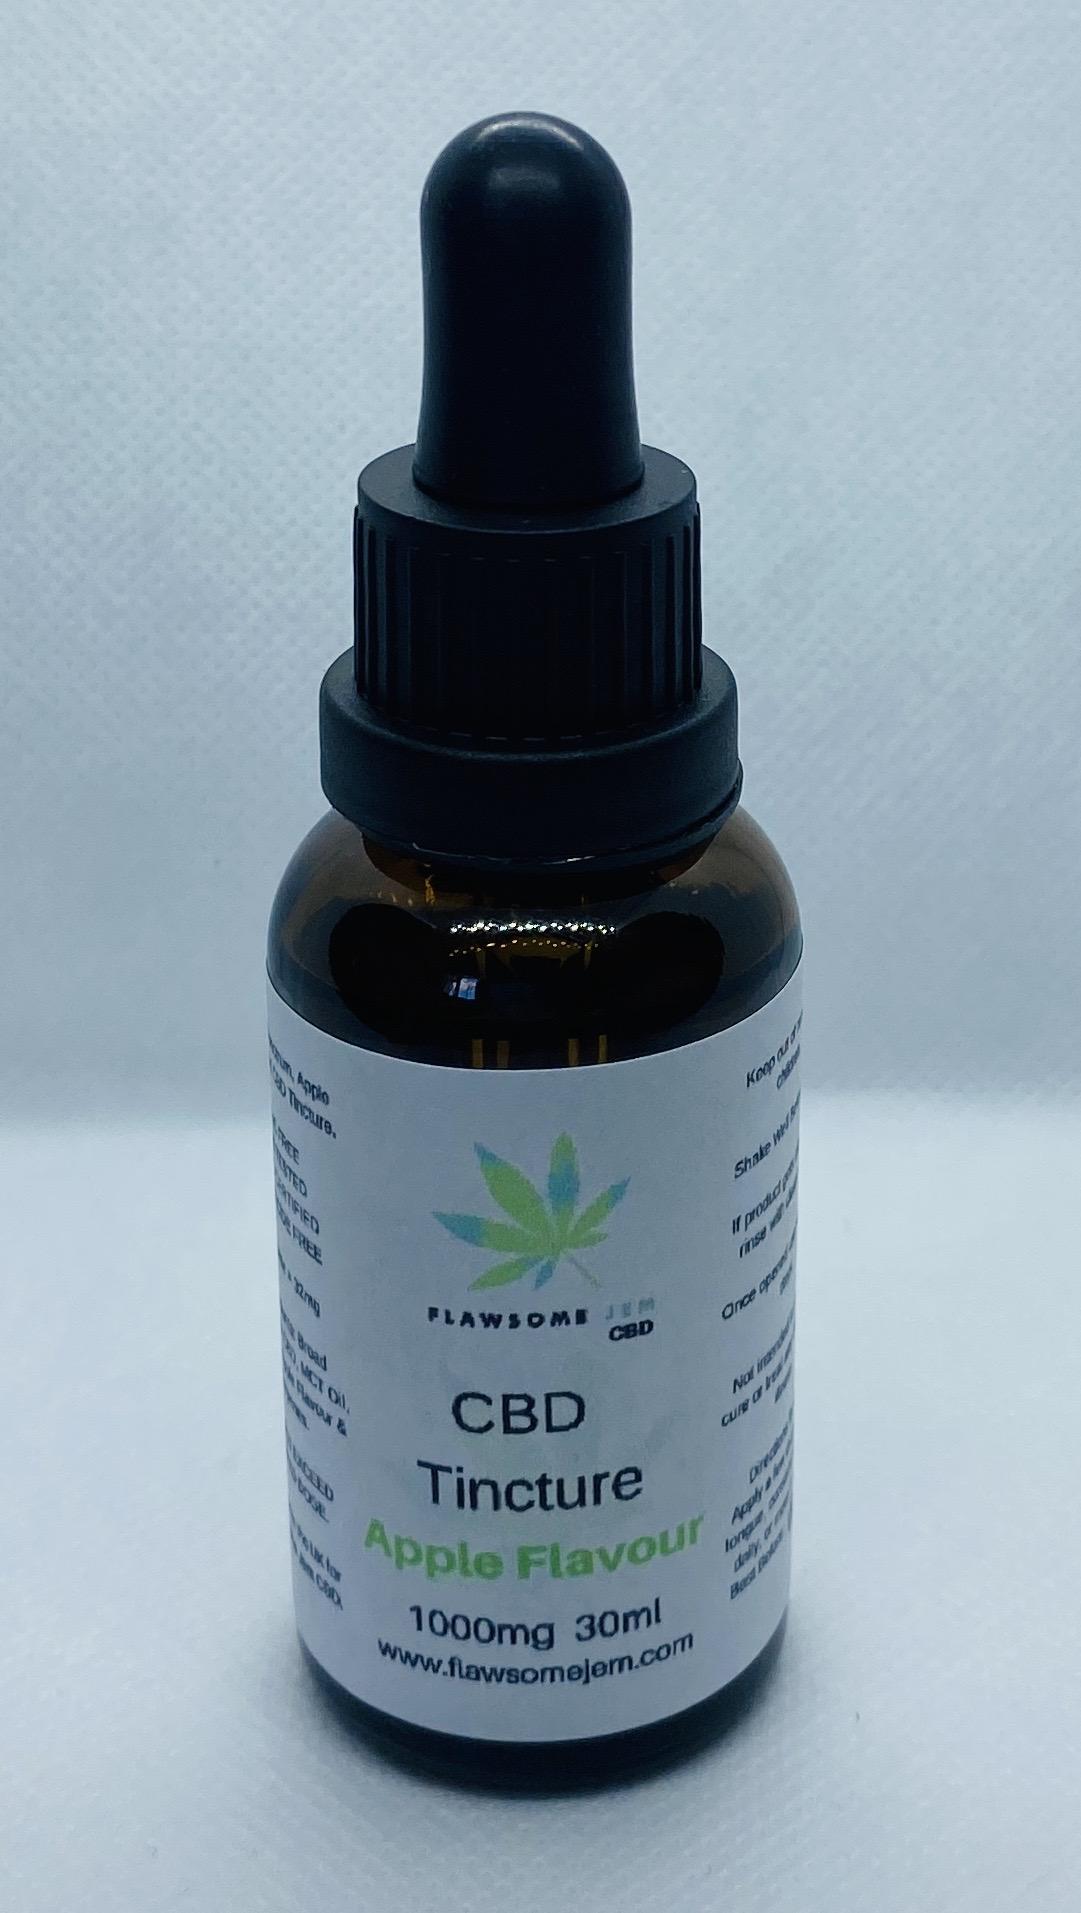 Broad Spectrum CBD Tincture, Apple Flavour, 1000mg, 30ml